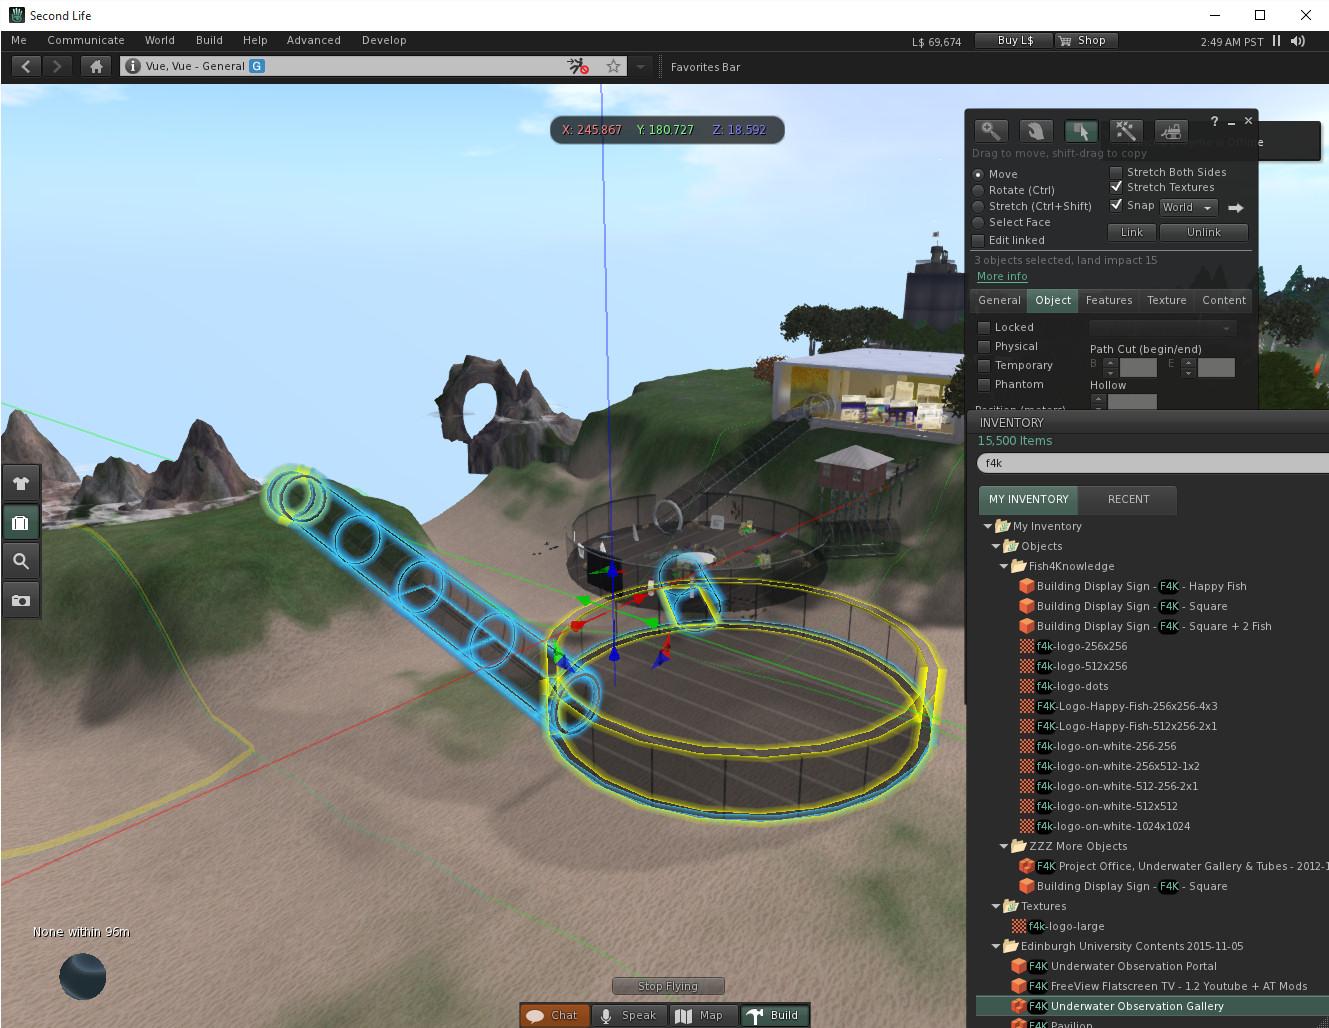 Fish4knowledge Virtual World Pavilion Move To Vue